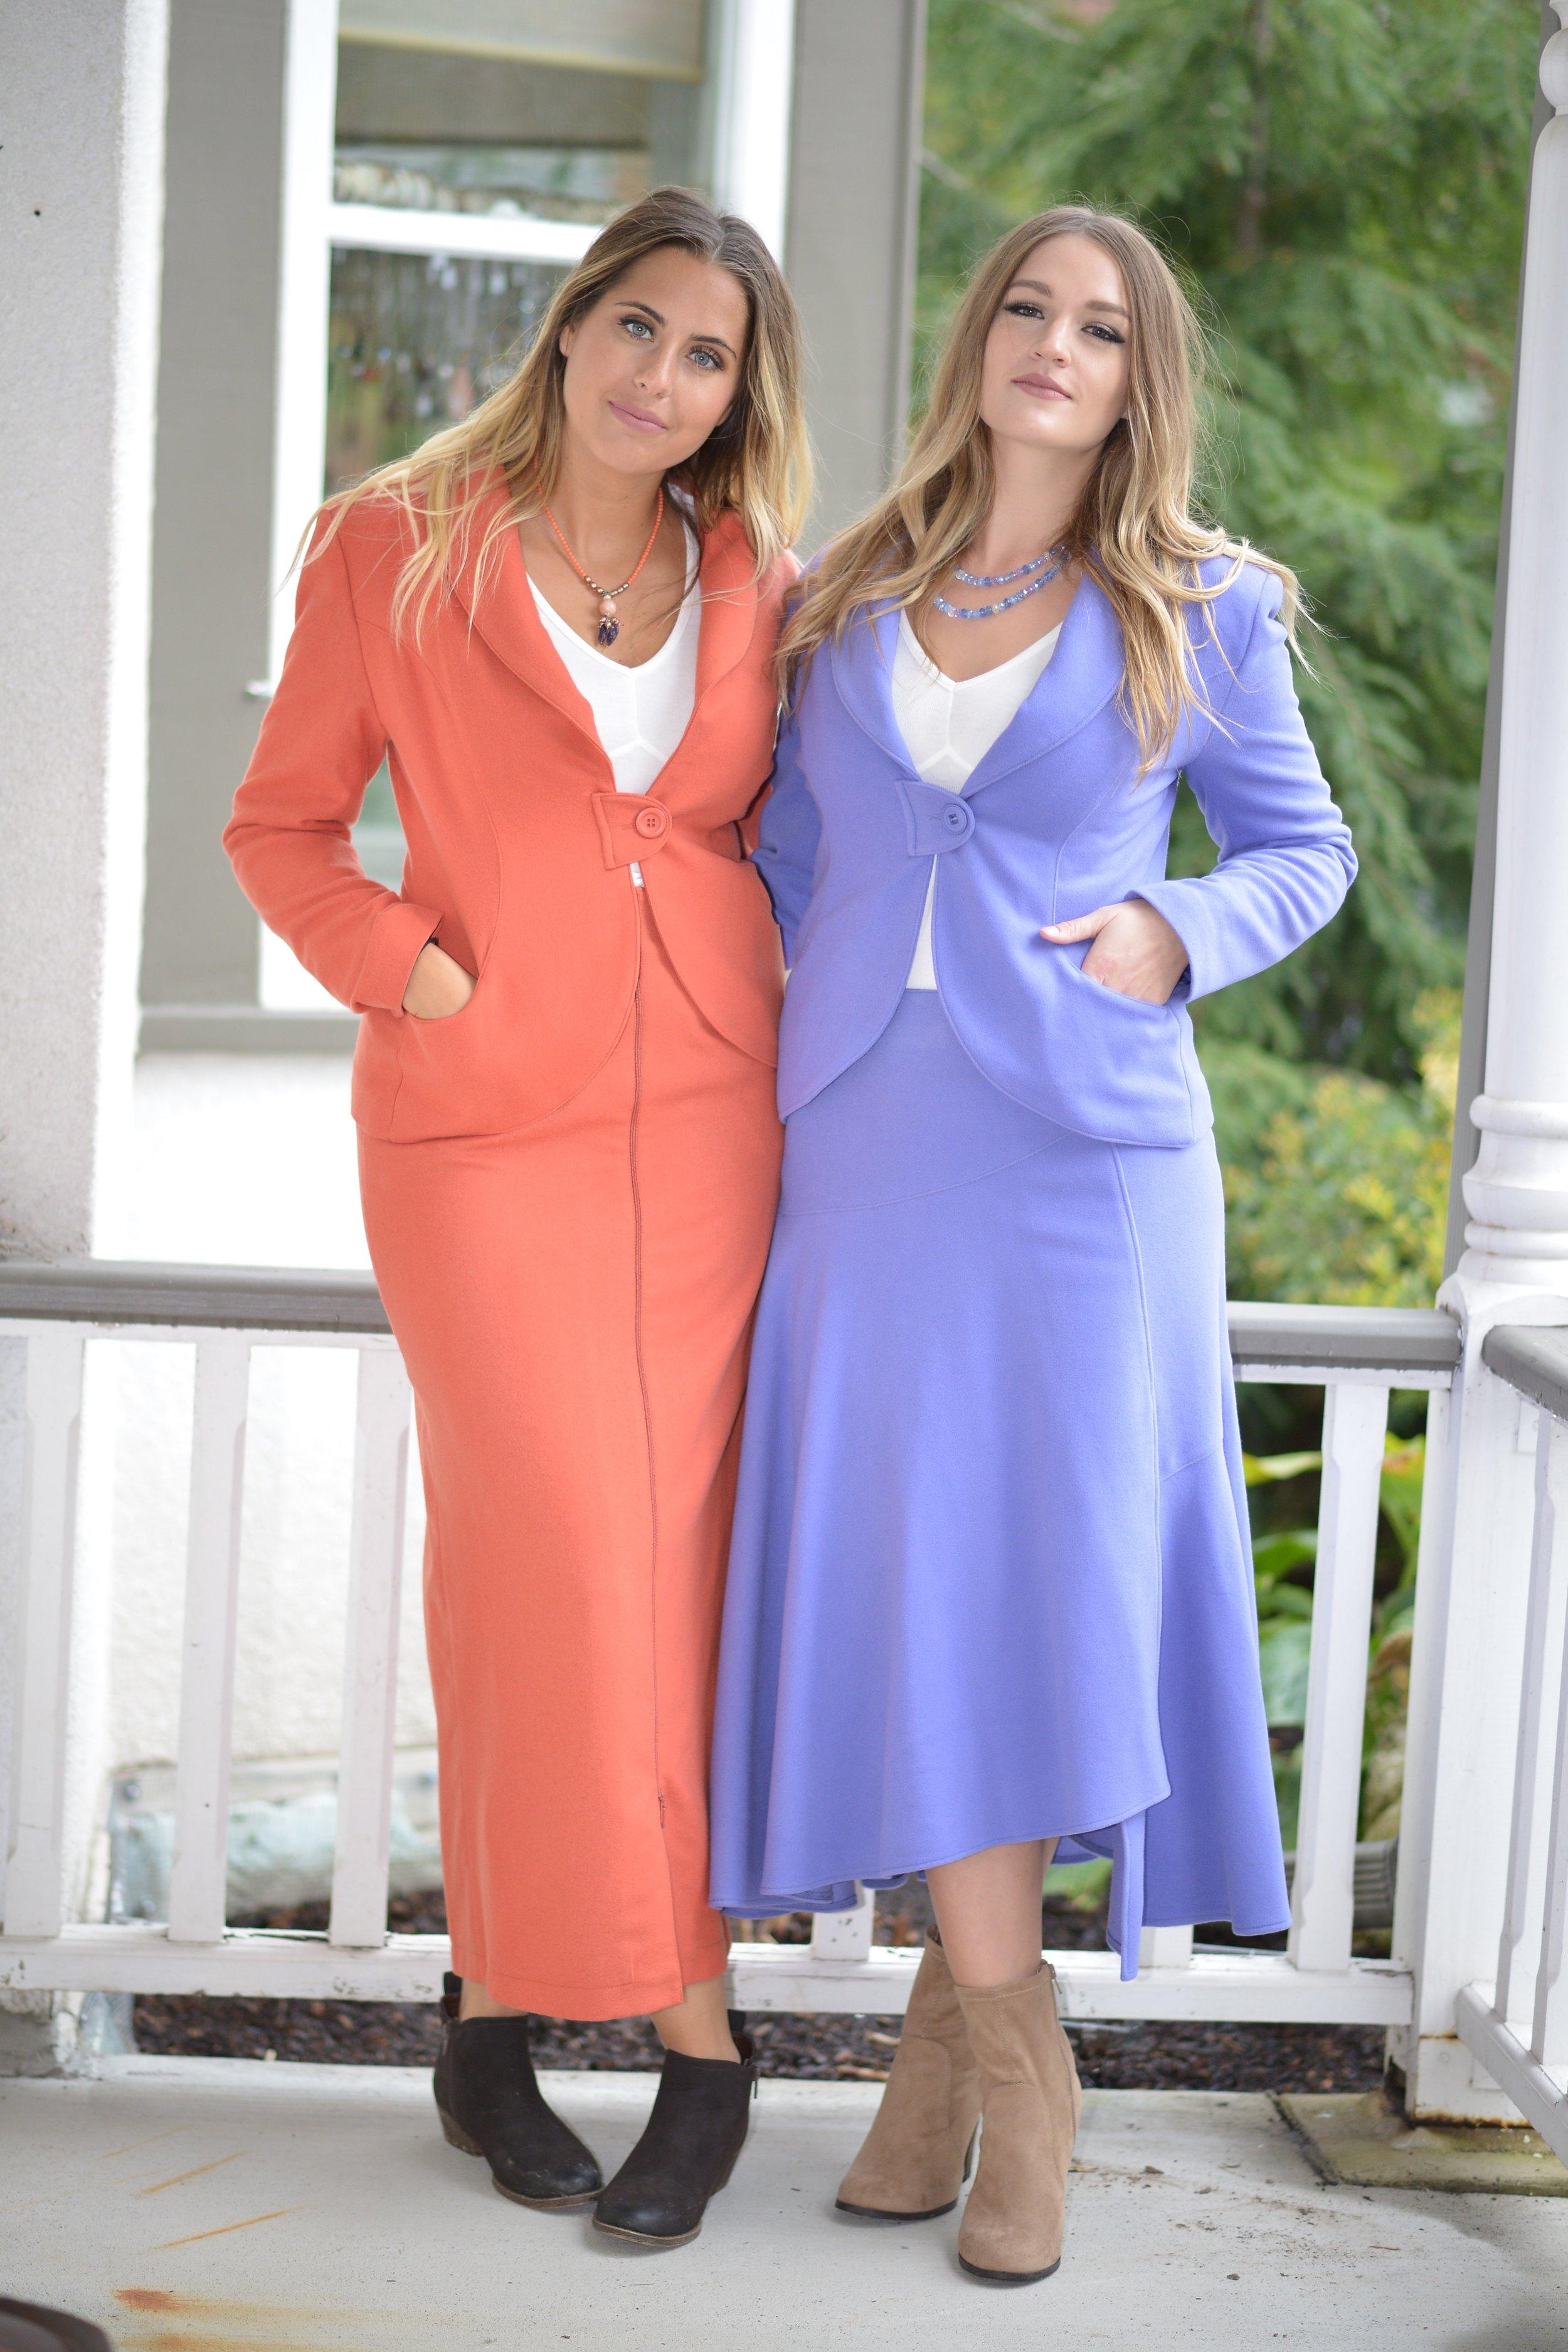 Orange button tab jacket and zipper skirt/ lilac button tab jacket and flirt skirt